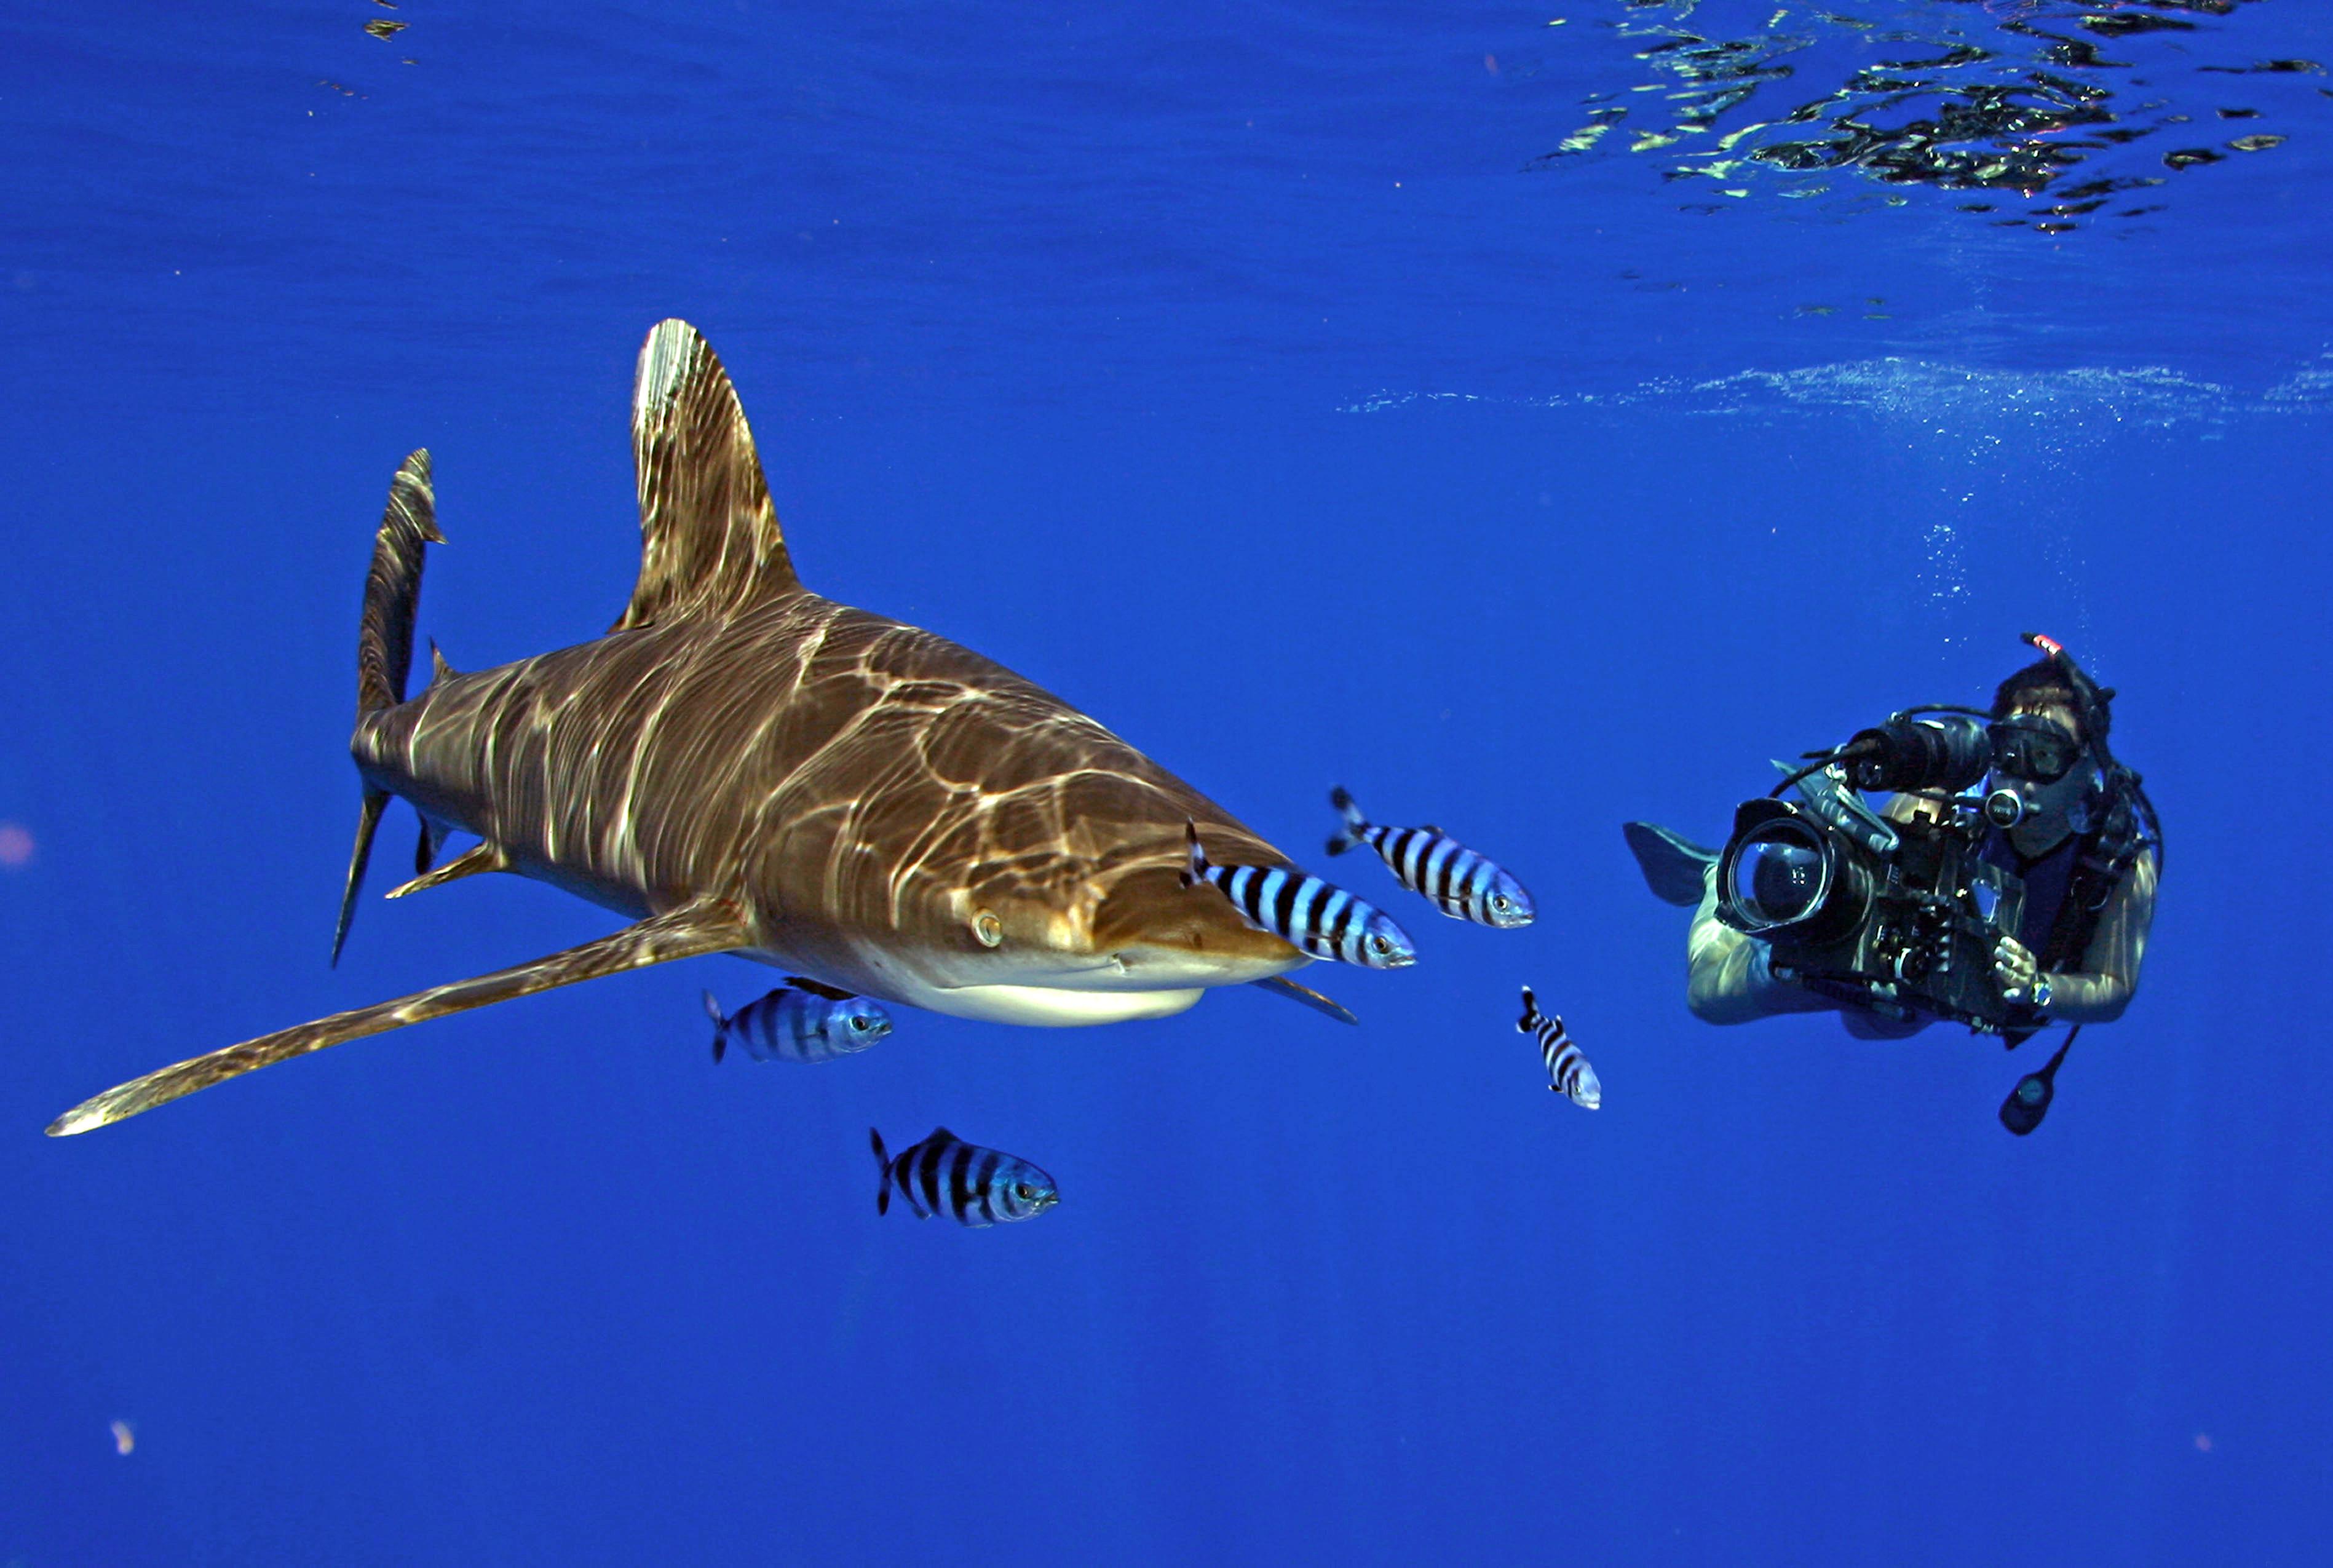 акула, дайвер, похороны за свой счёт